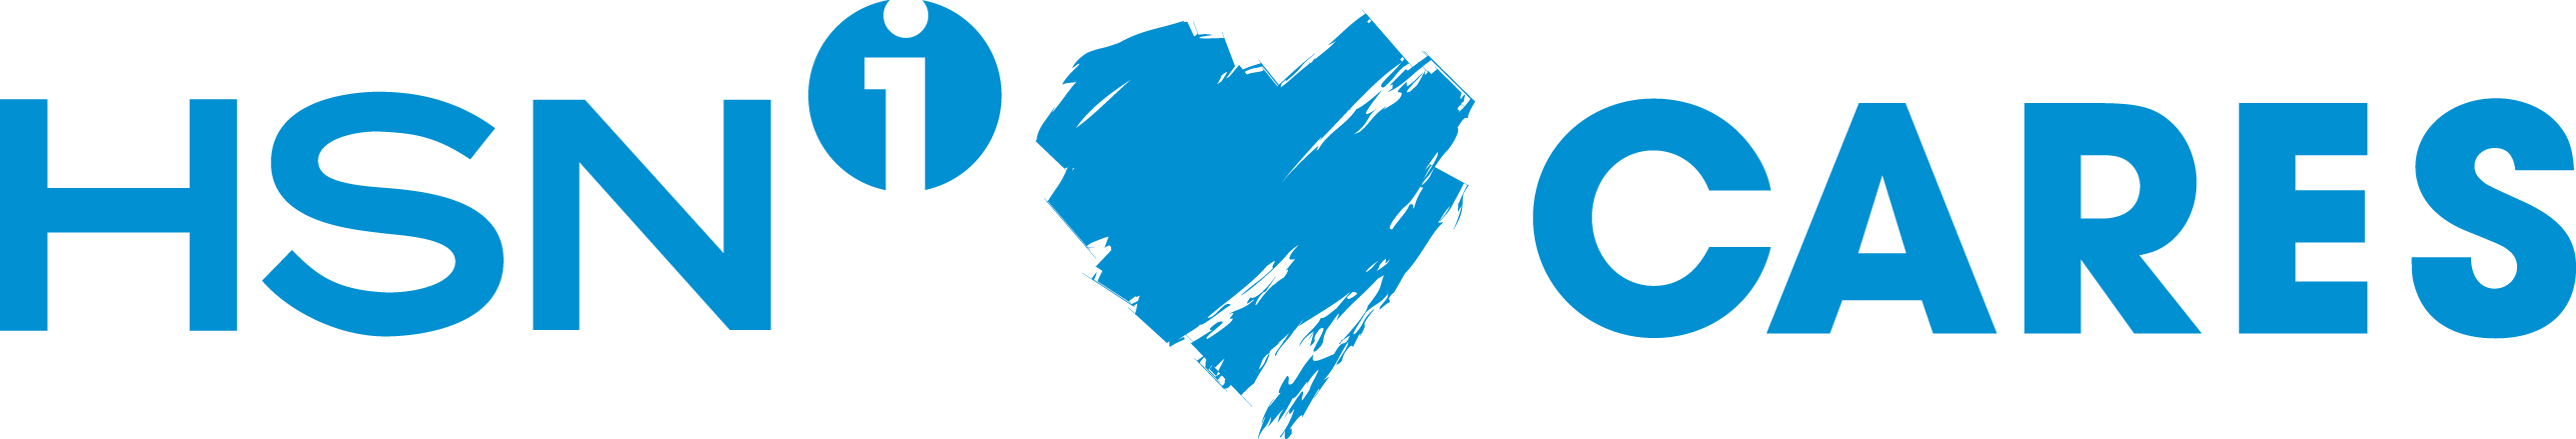 HSN Cares Logo - Blue